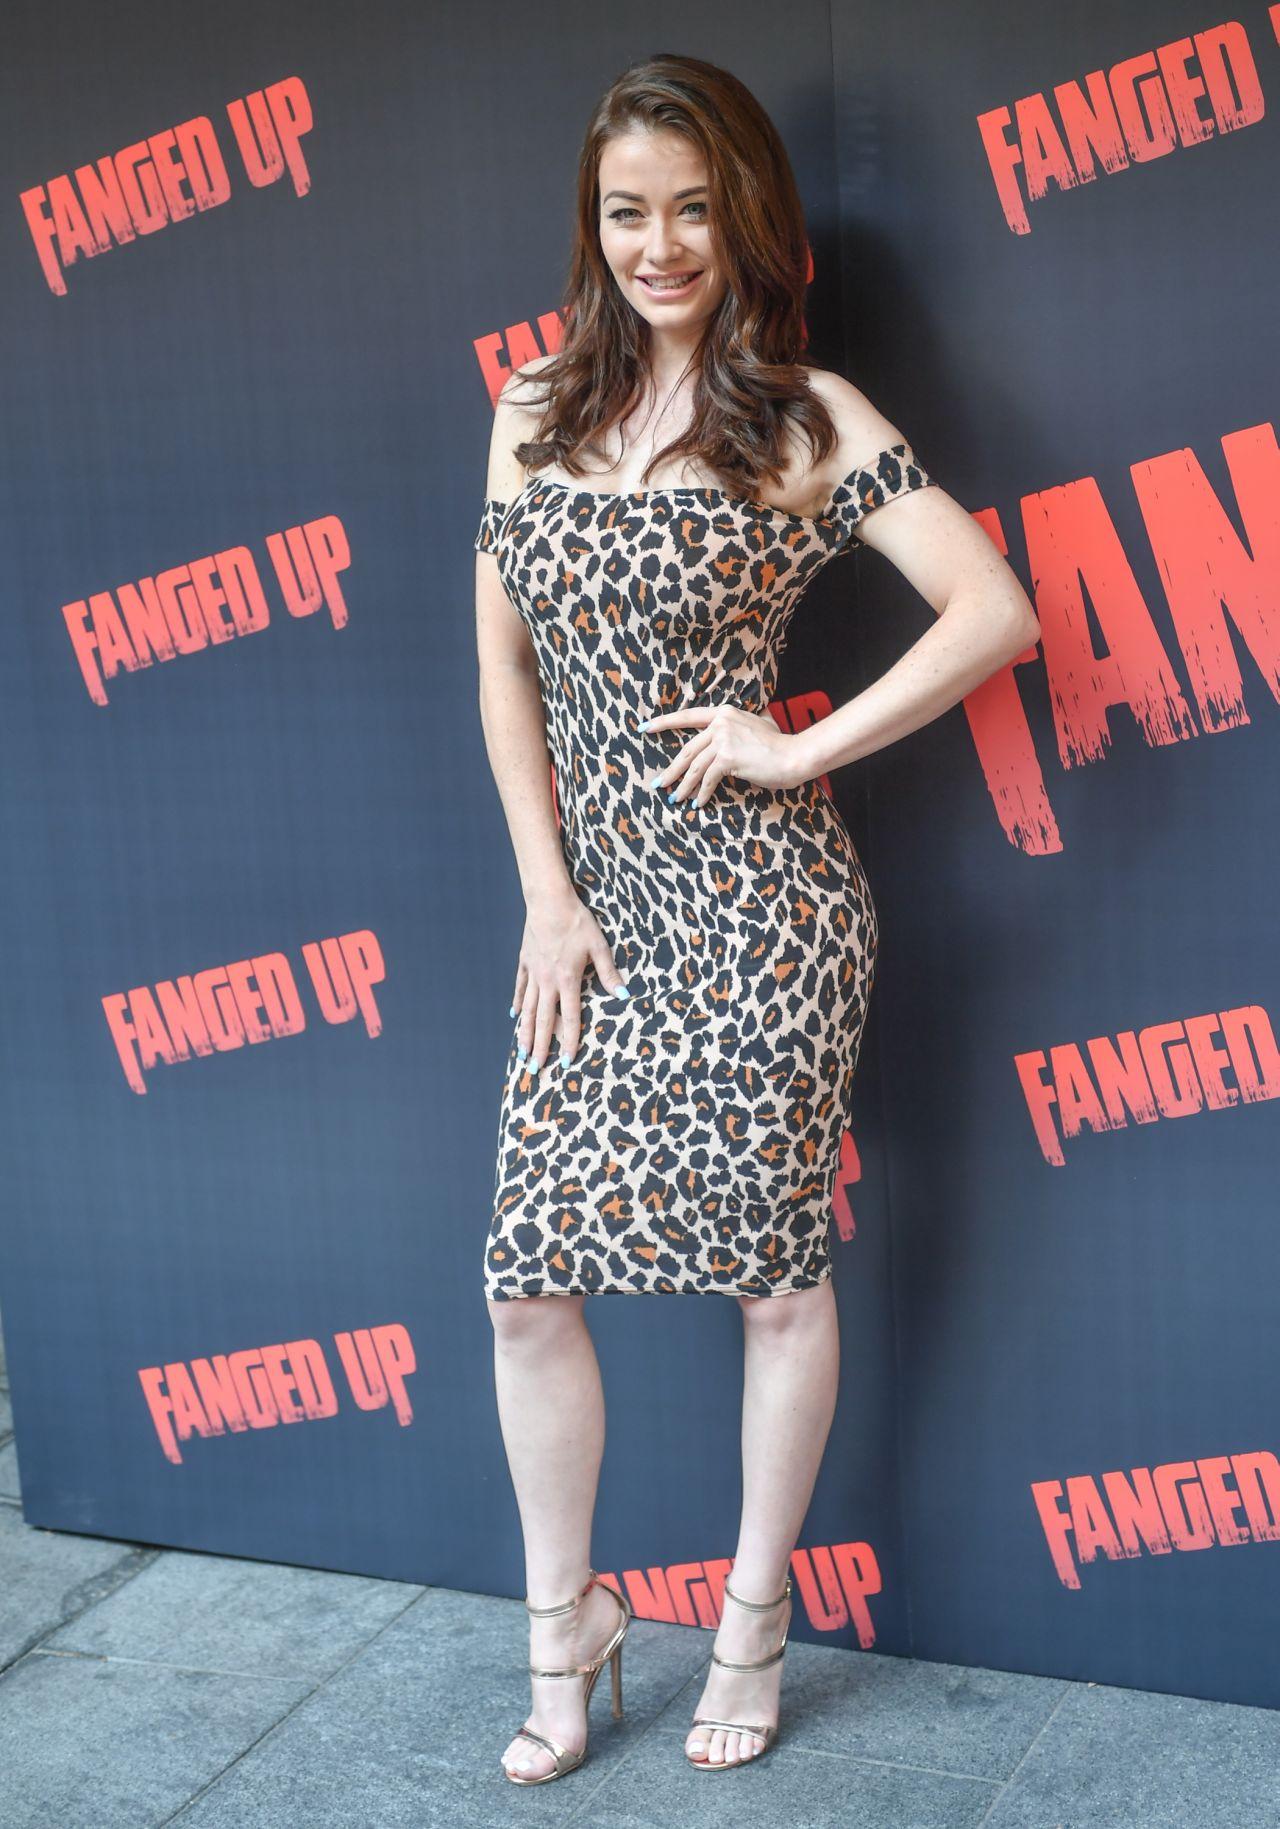 Danielle big brother celebrity 2019